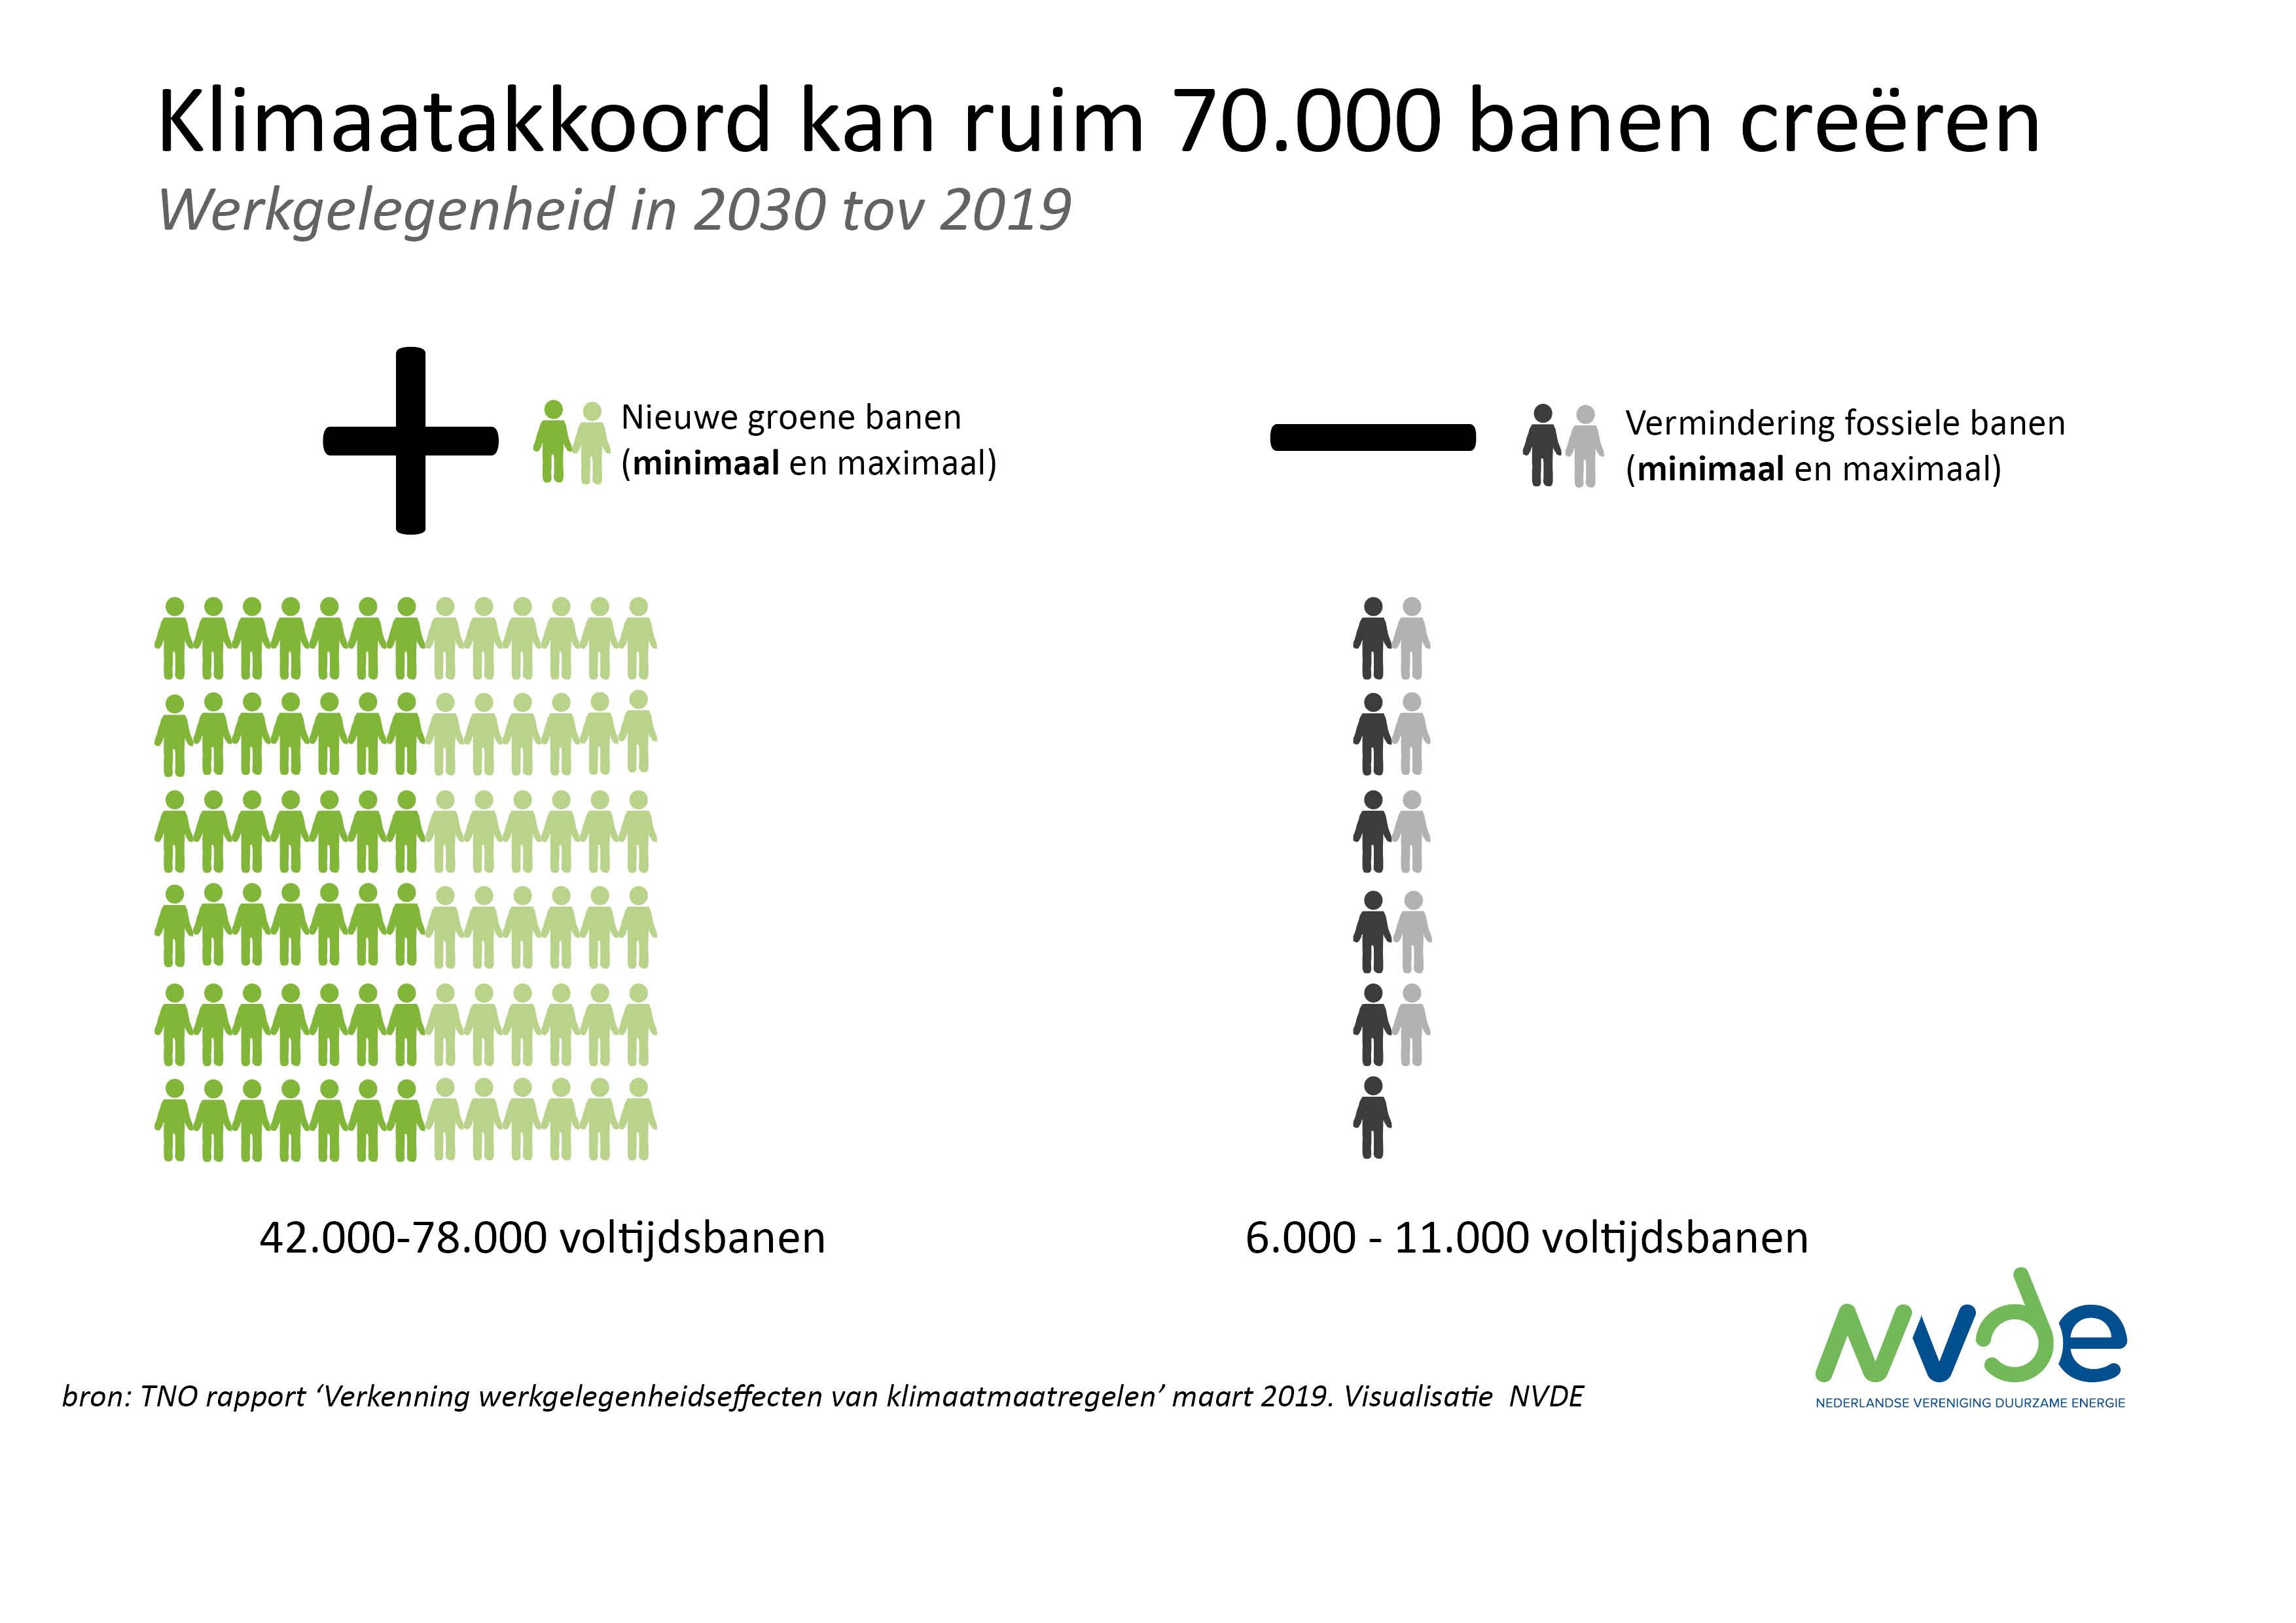 Homepage - NVDE - Nederlandse Vereniging Duurzame Energie 766fd70229